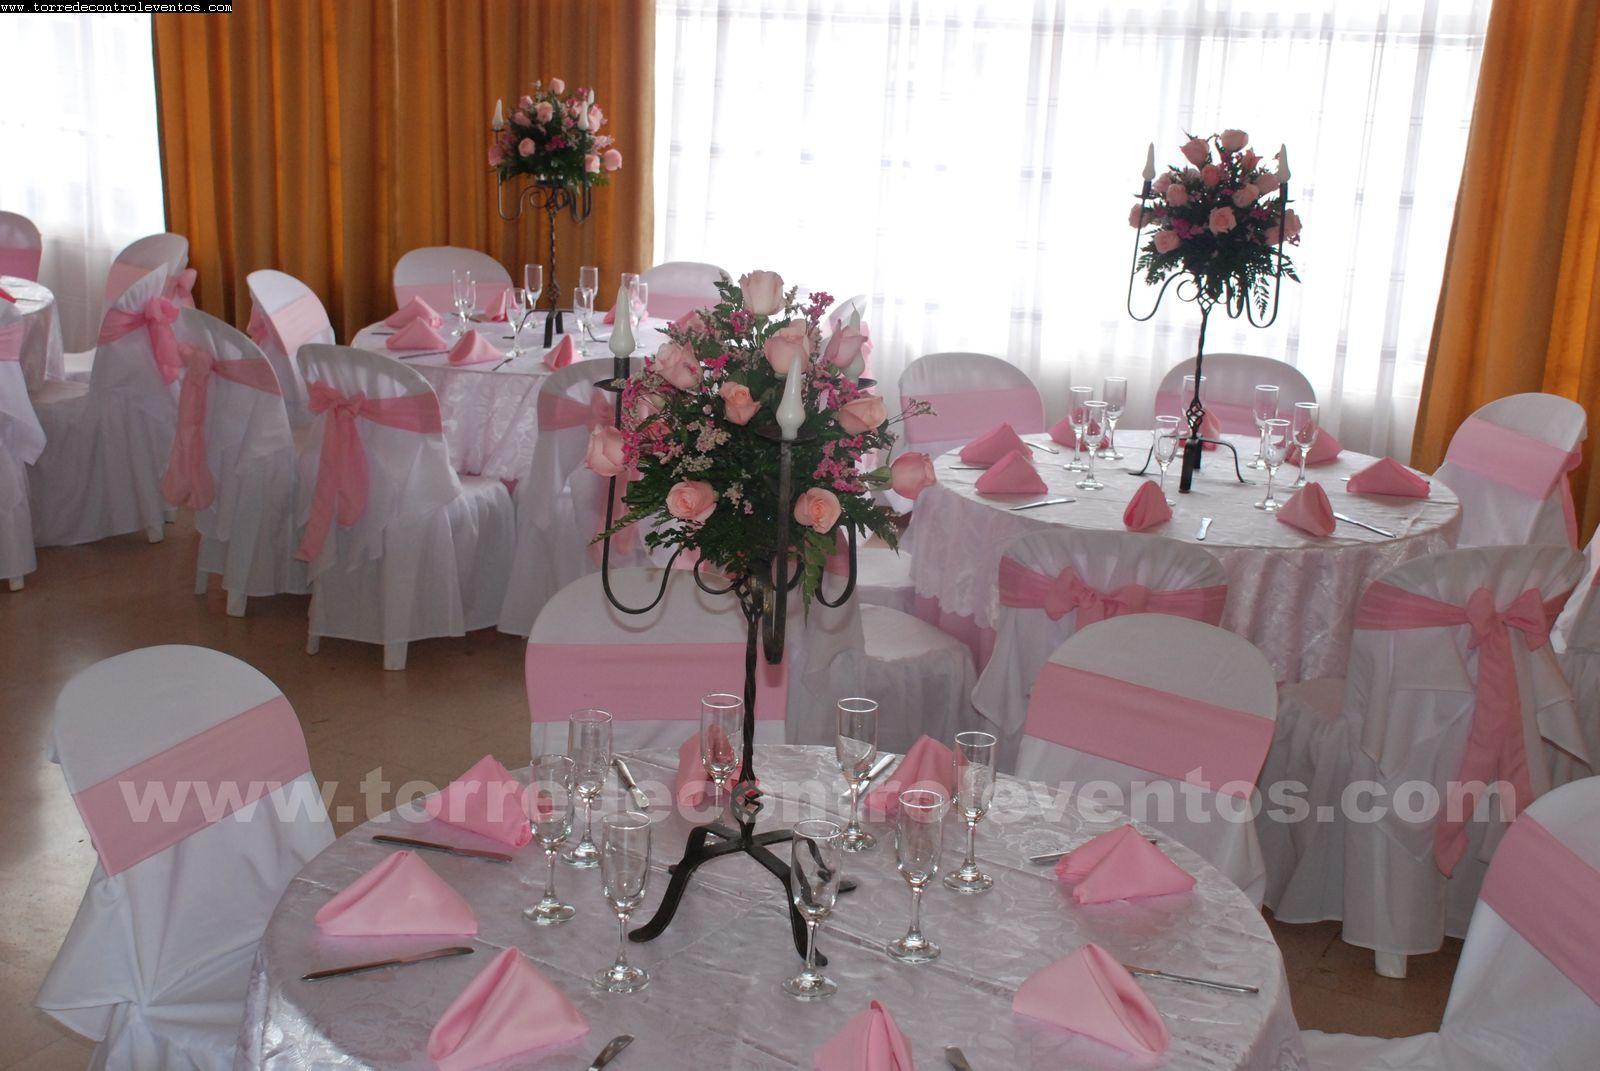 Primera comunin nias for Fiestas comunion decoracion